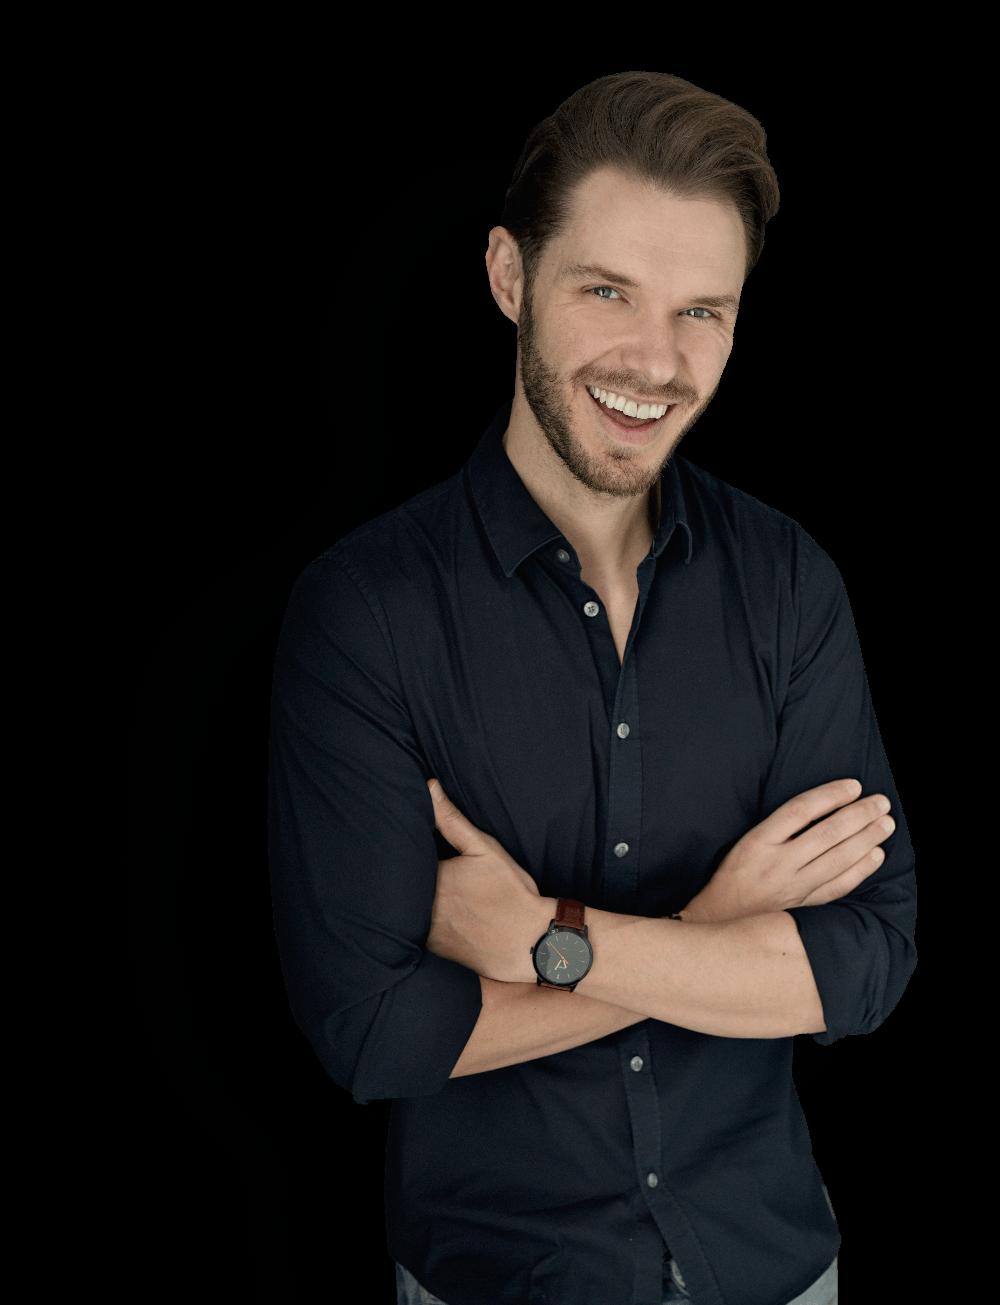 Martin Vachon